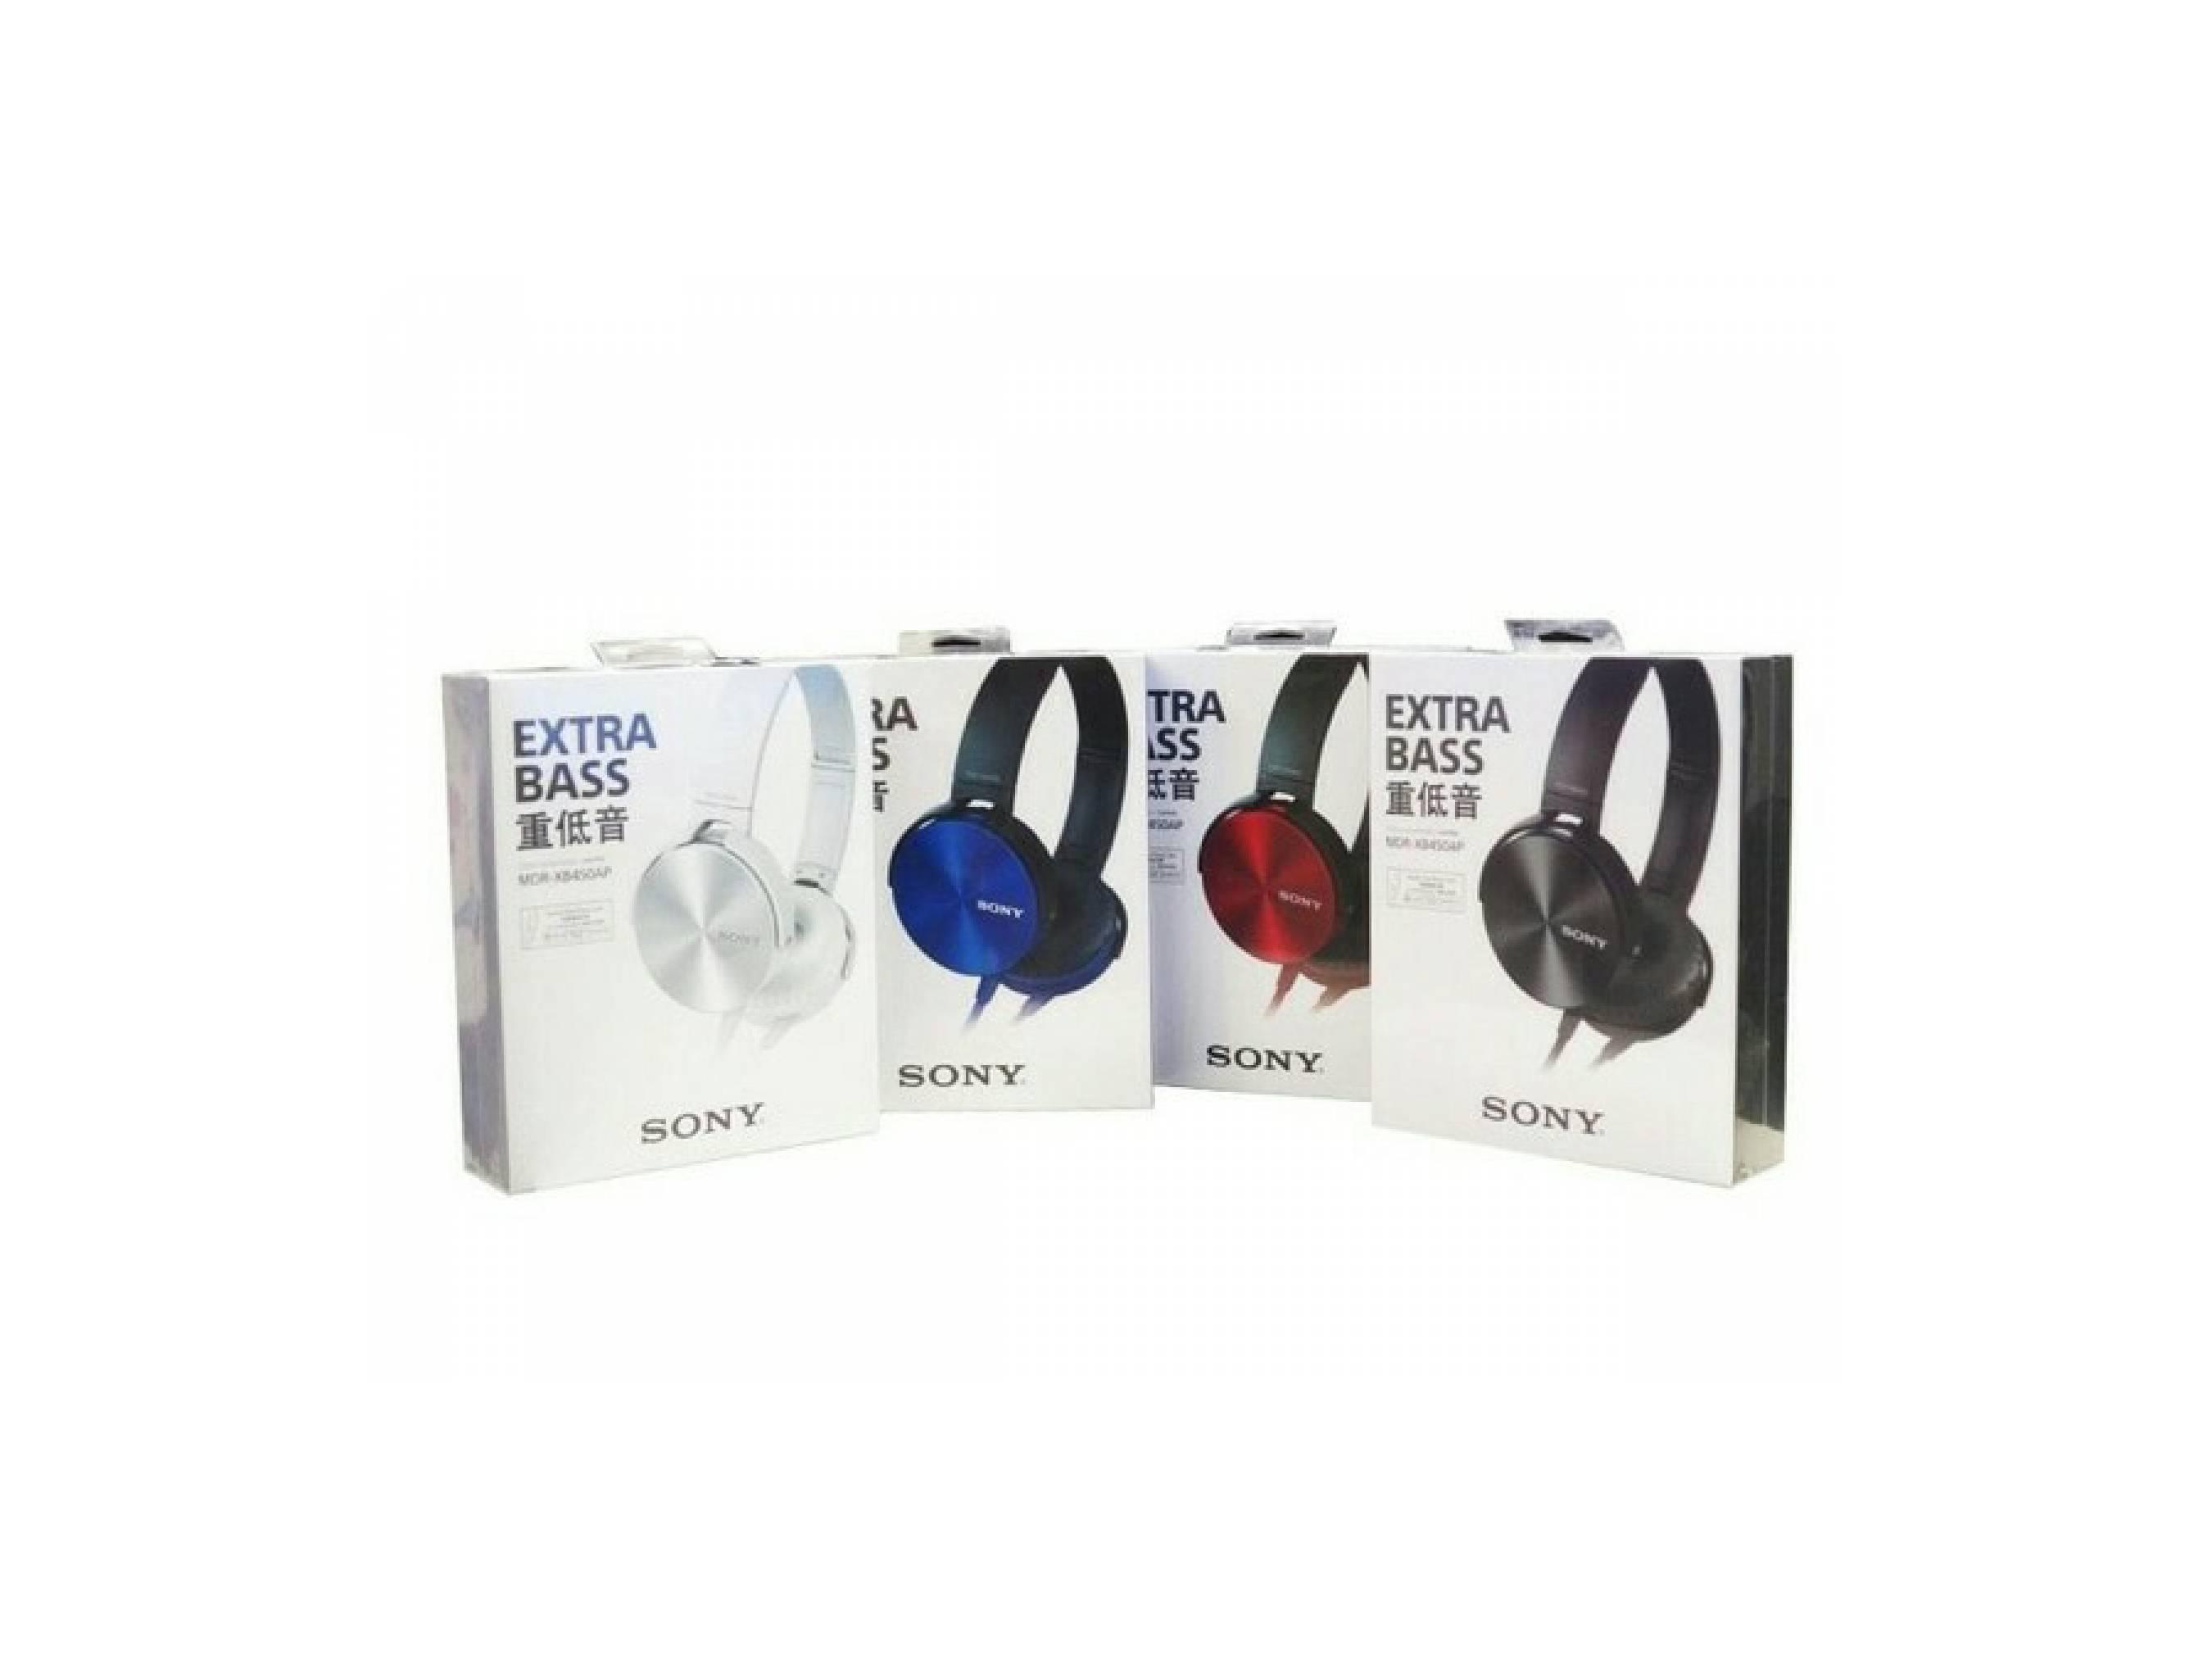 Cek Harga Baru Sony Mdr Xb450ap Extra Bass Headphone Headset 450 Gambar Produk Rinci Handfree Earphone Terkini